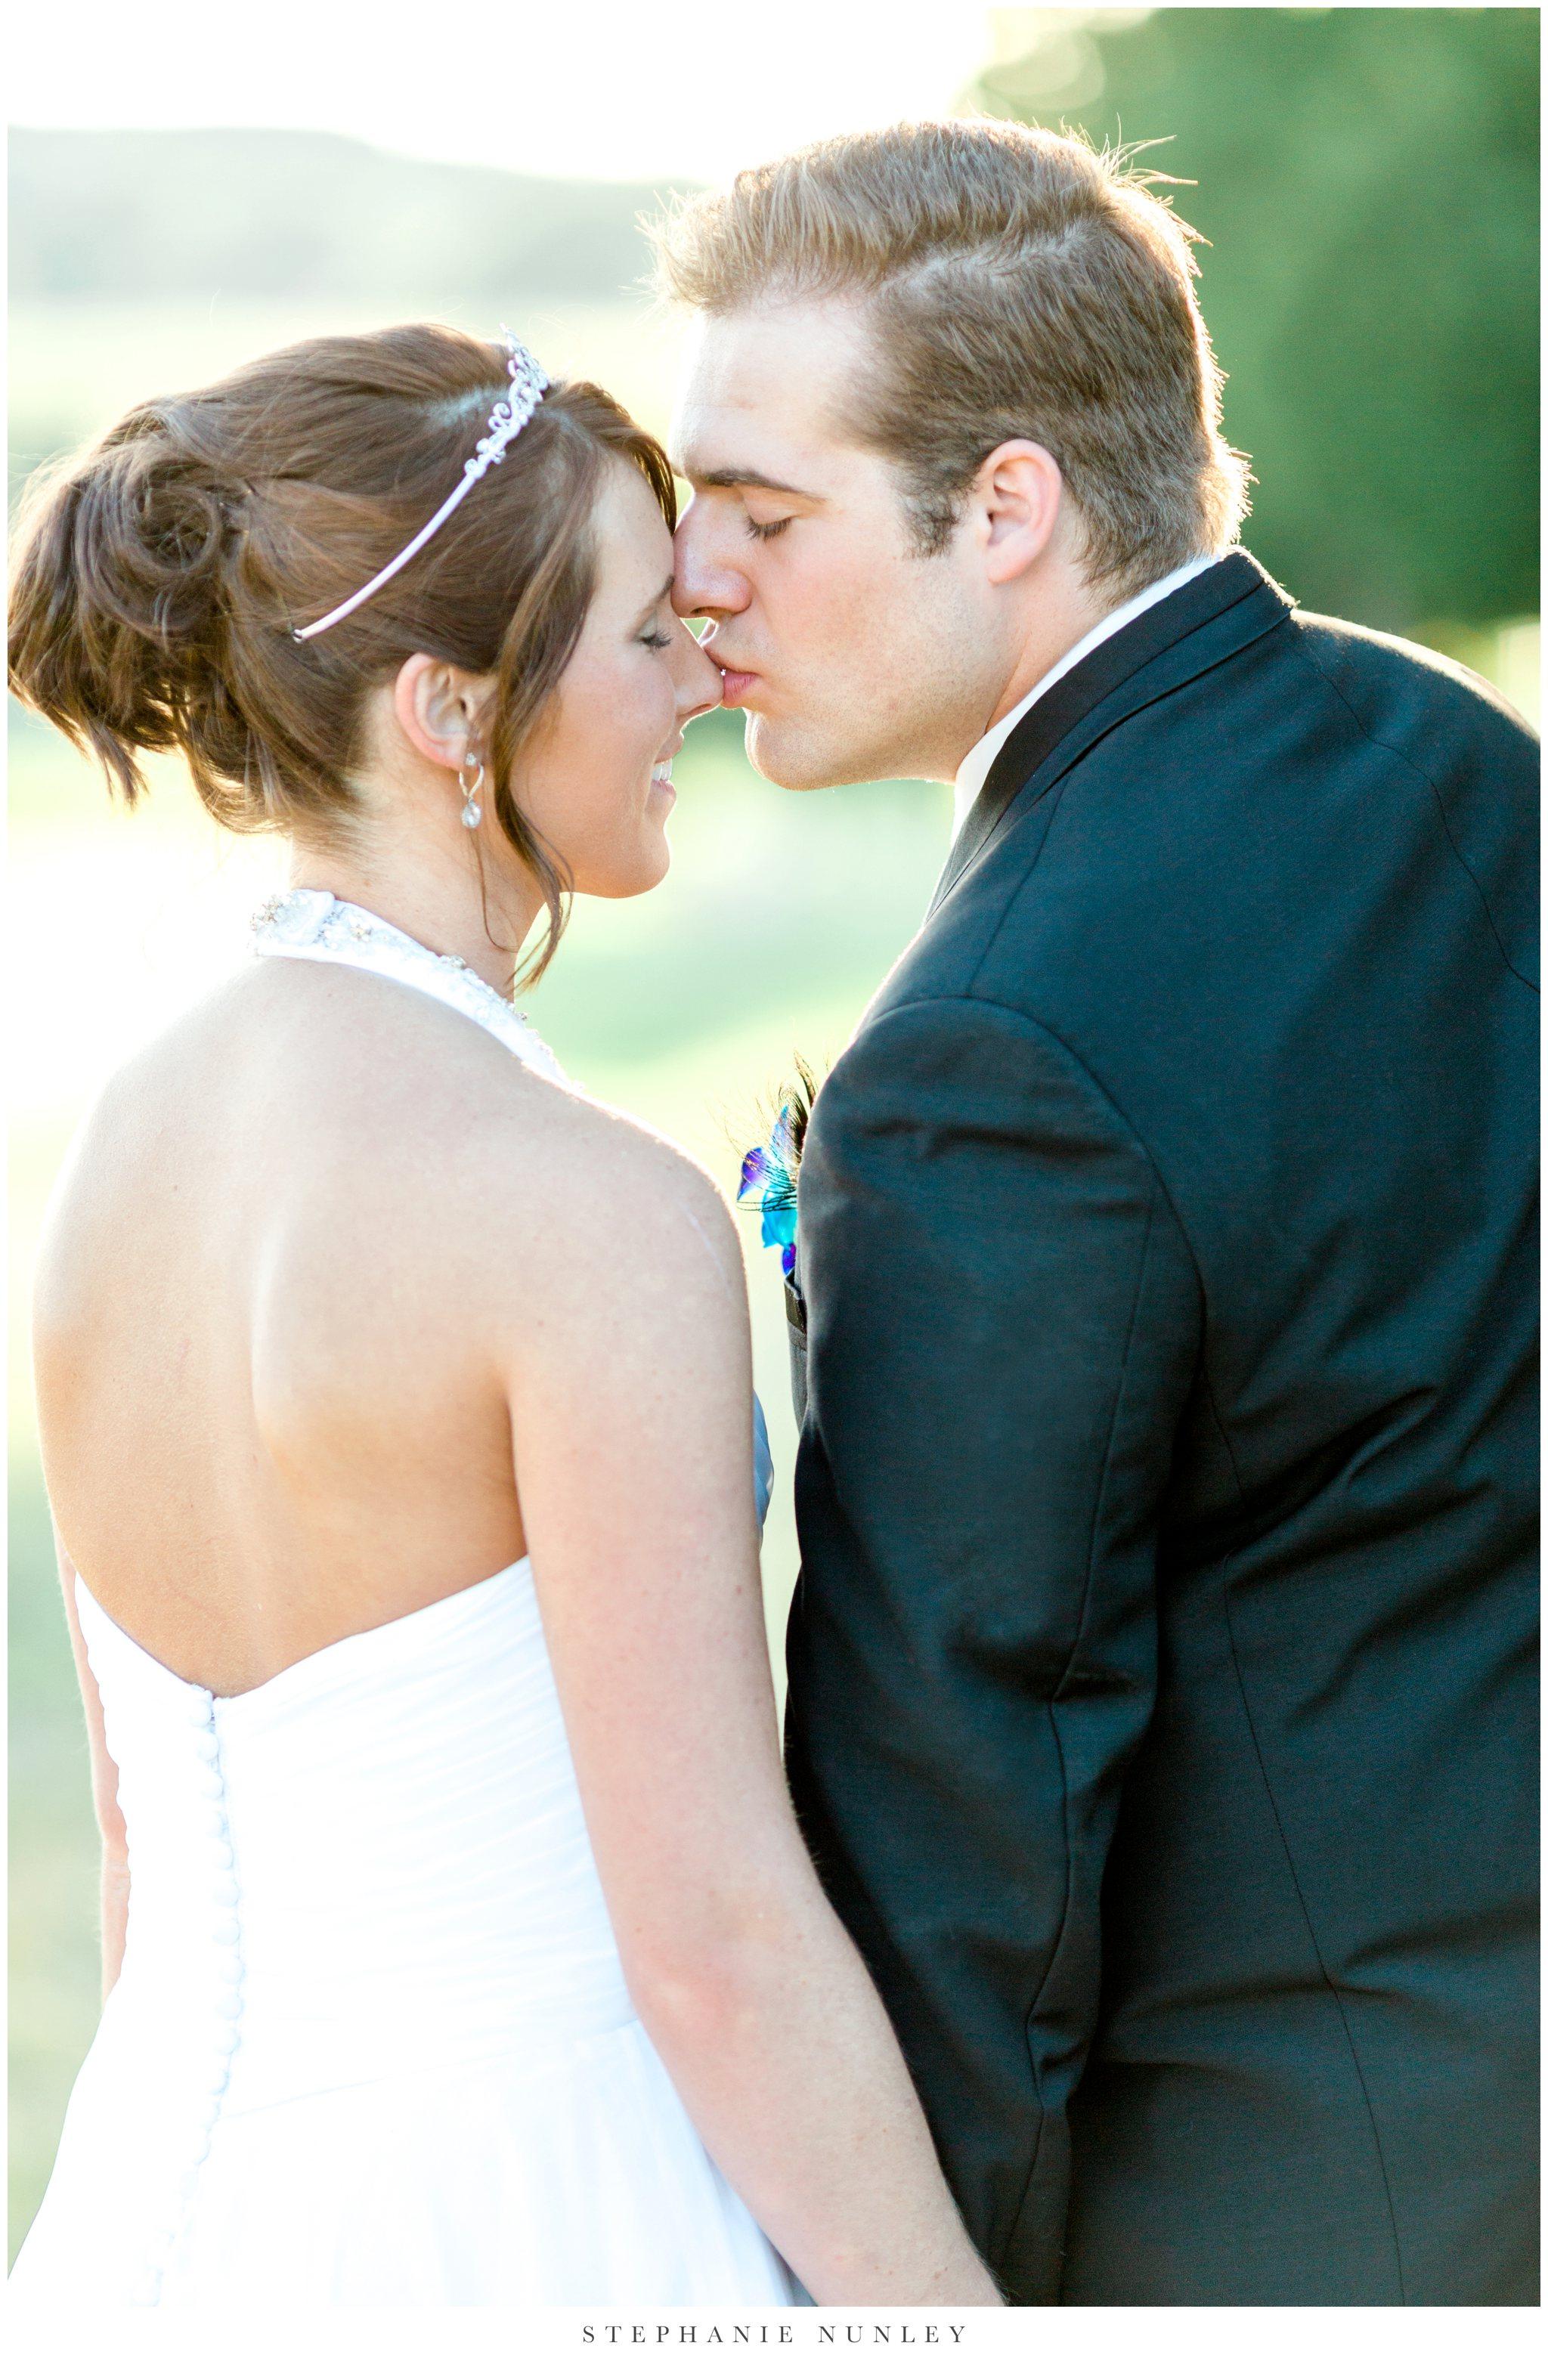 fine-art-destination-wedding-photographer-0079.jpg